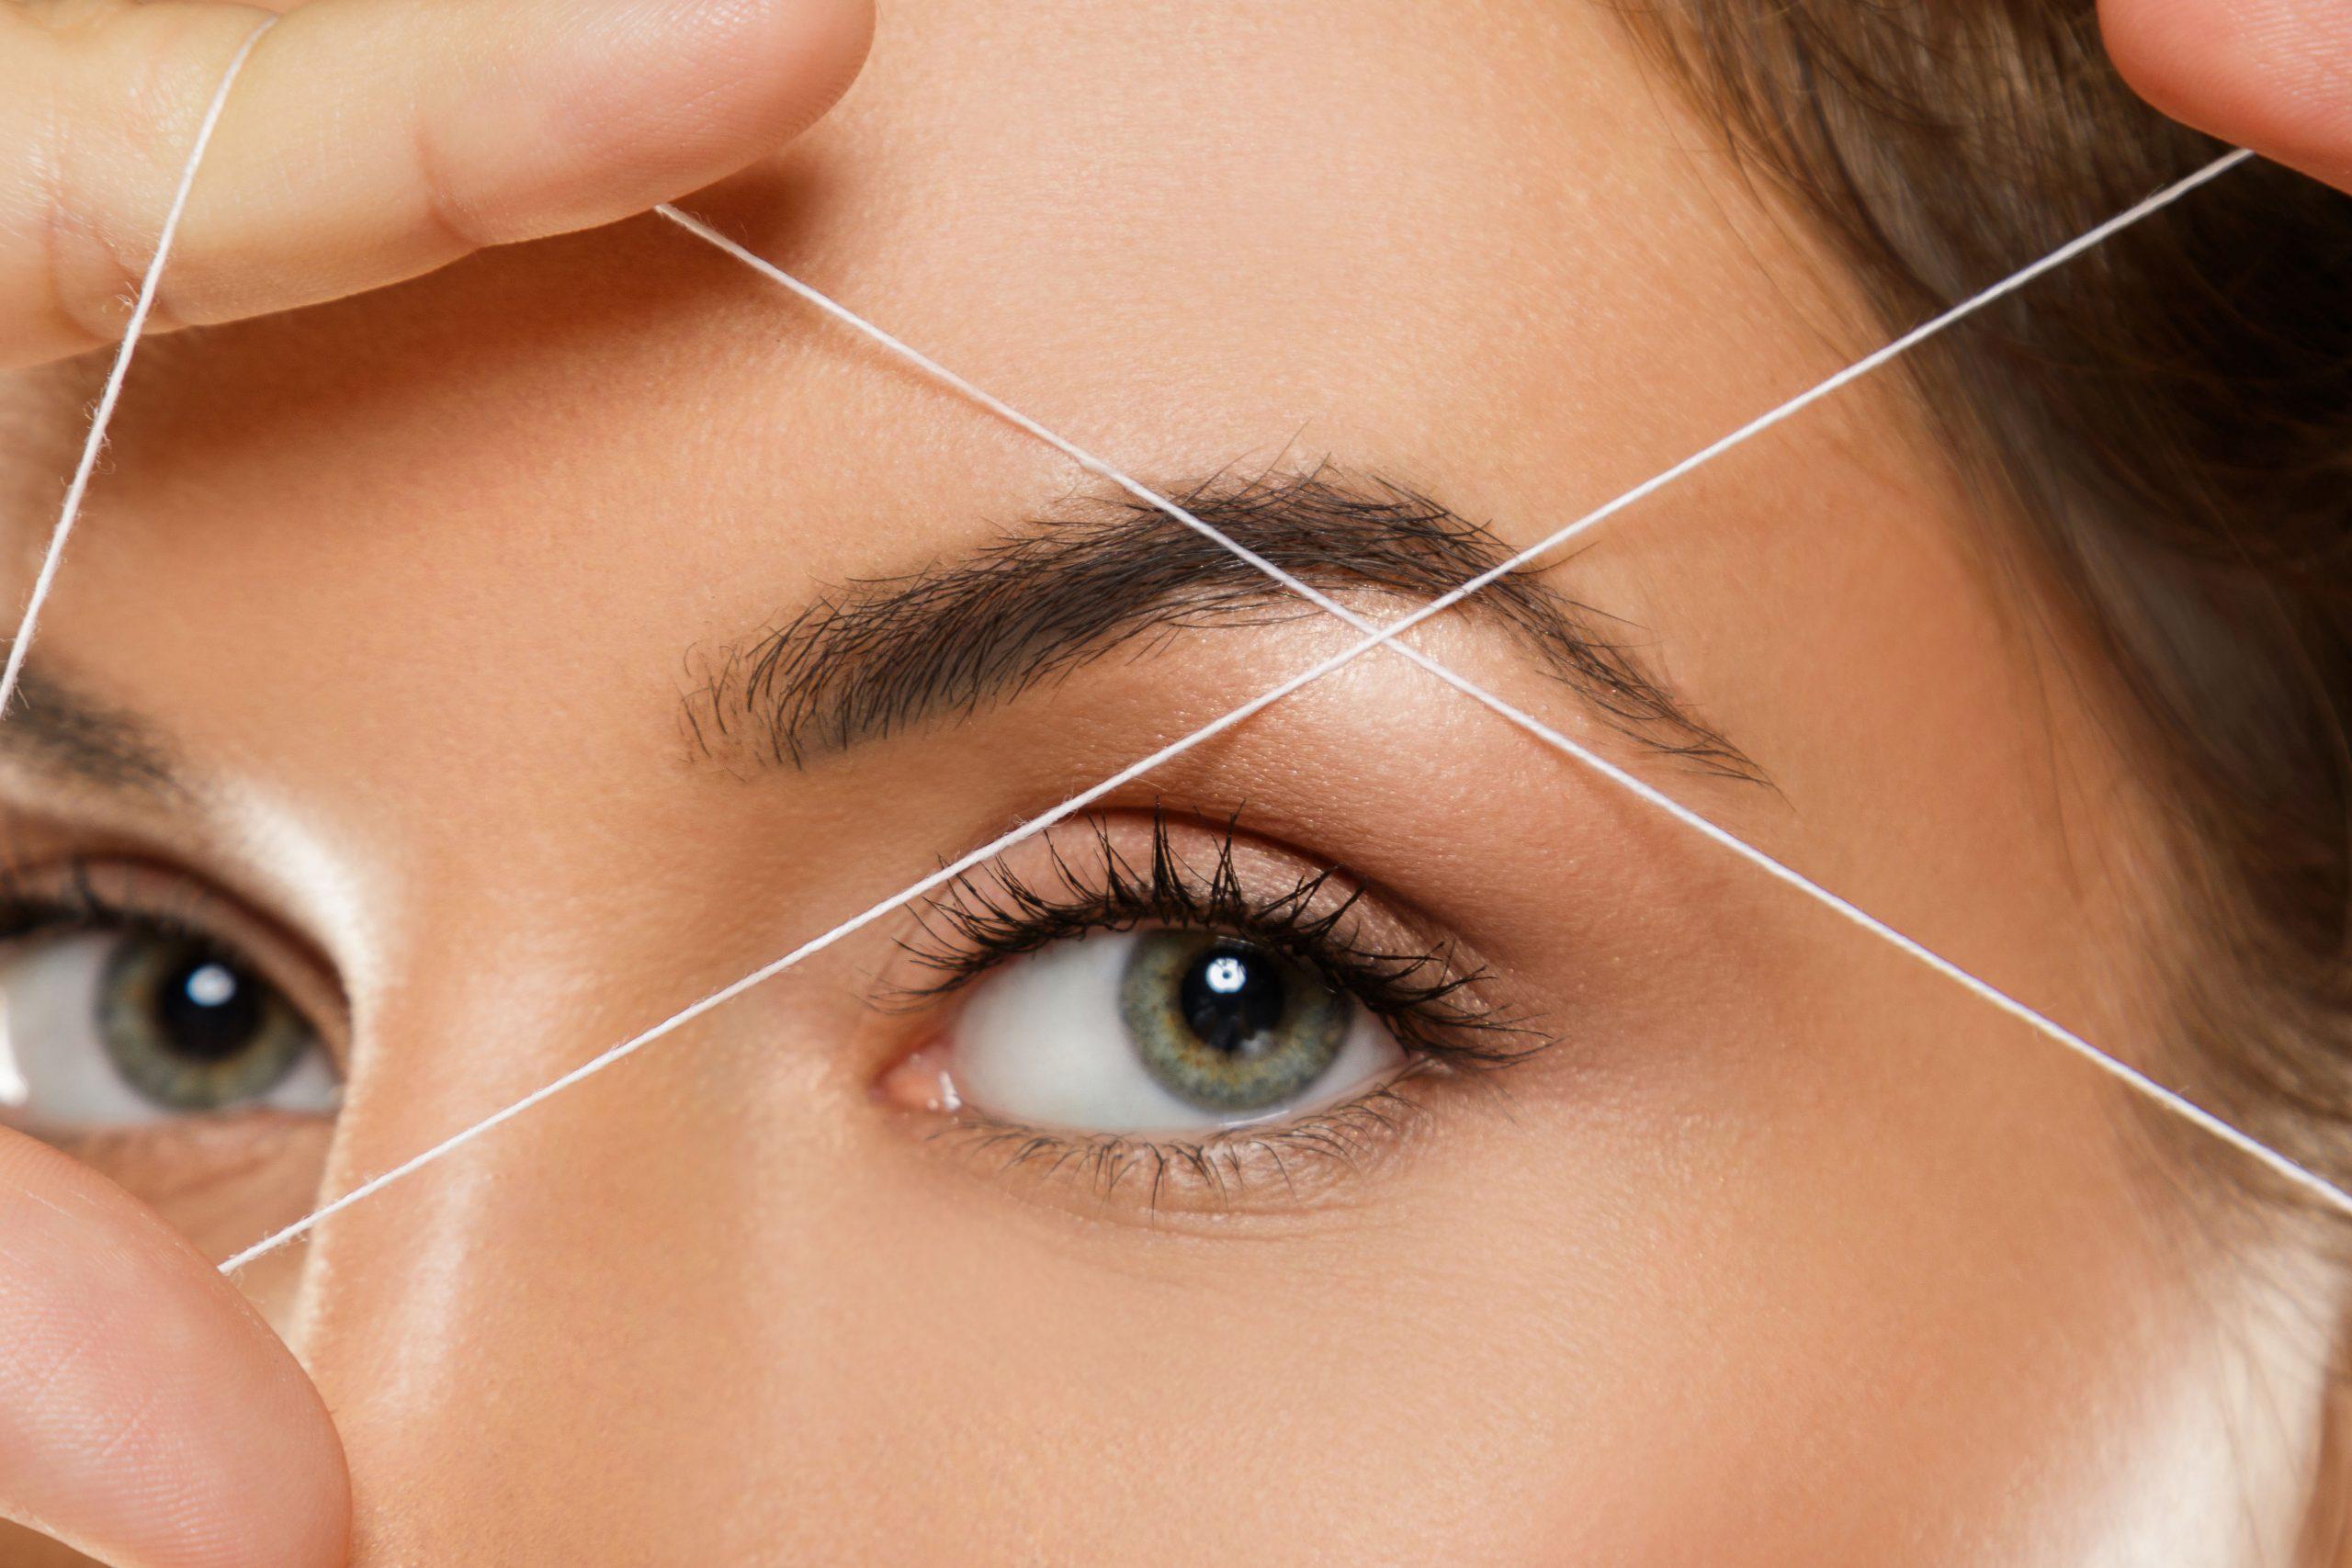 Close-up,Of,Female,Eye,With,A,Thread.,Eyebrow,Threading,-